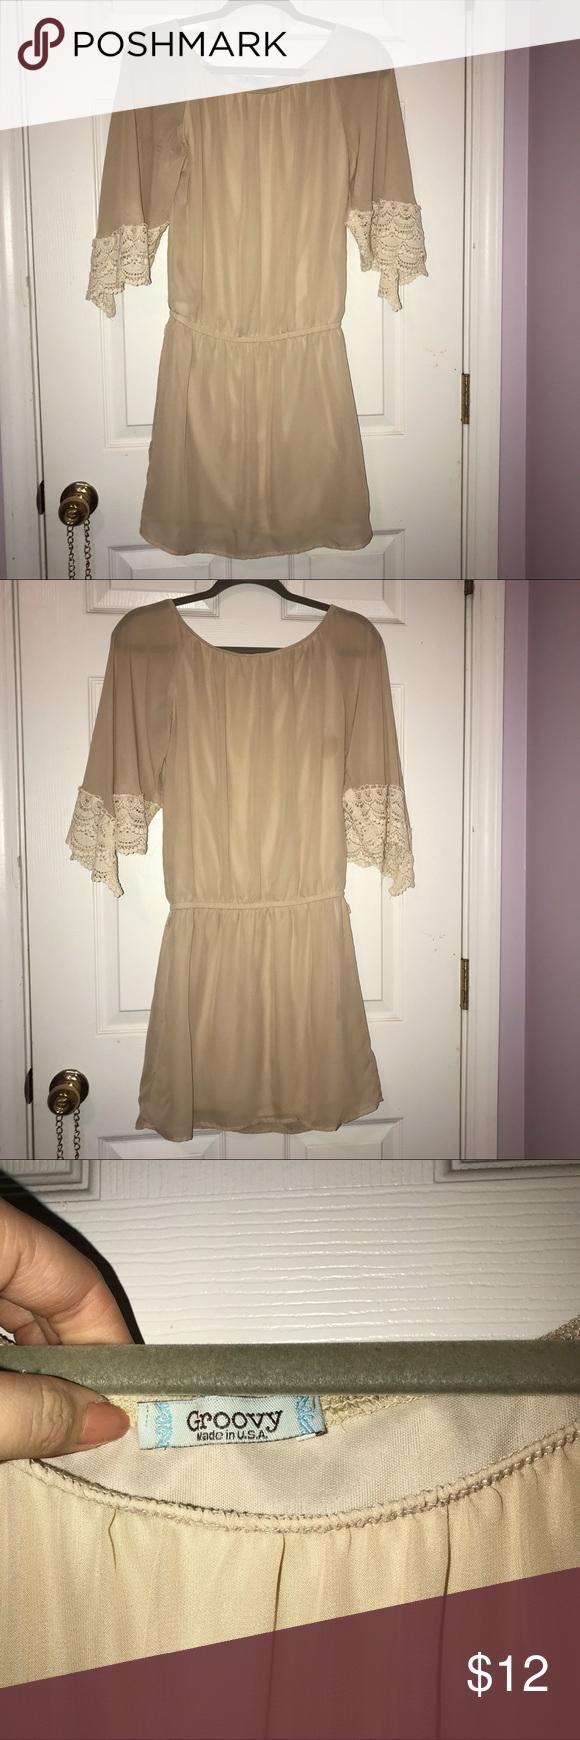 Sheer Tan Cream Long Sleeve Dress Cream Long Sleeve Dress Dresses Lace Shorts [ 1740 x 580 Pixel ]